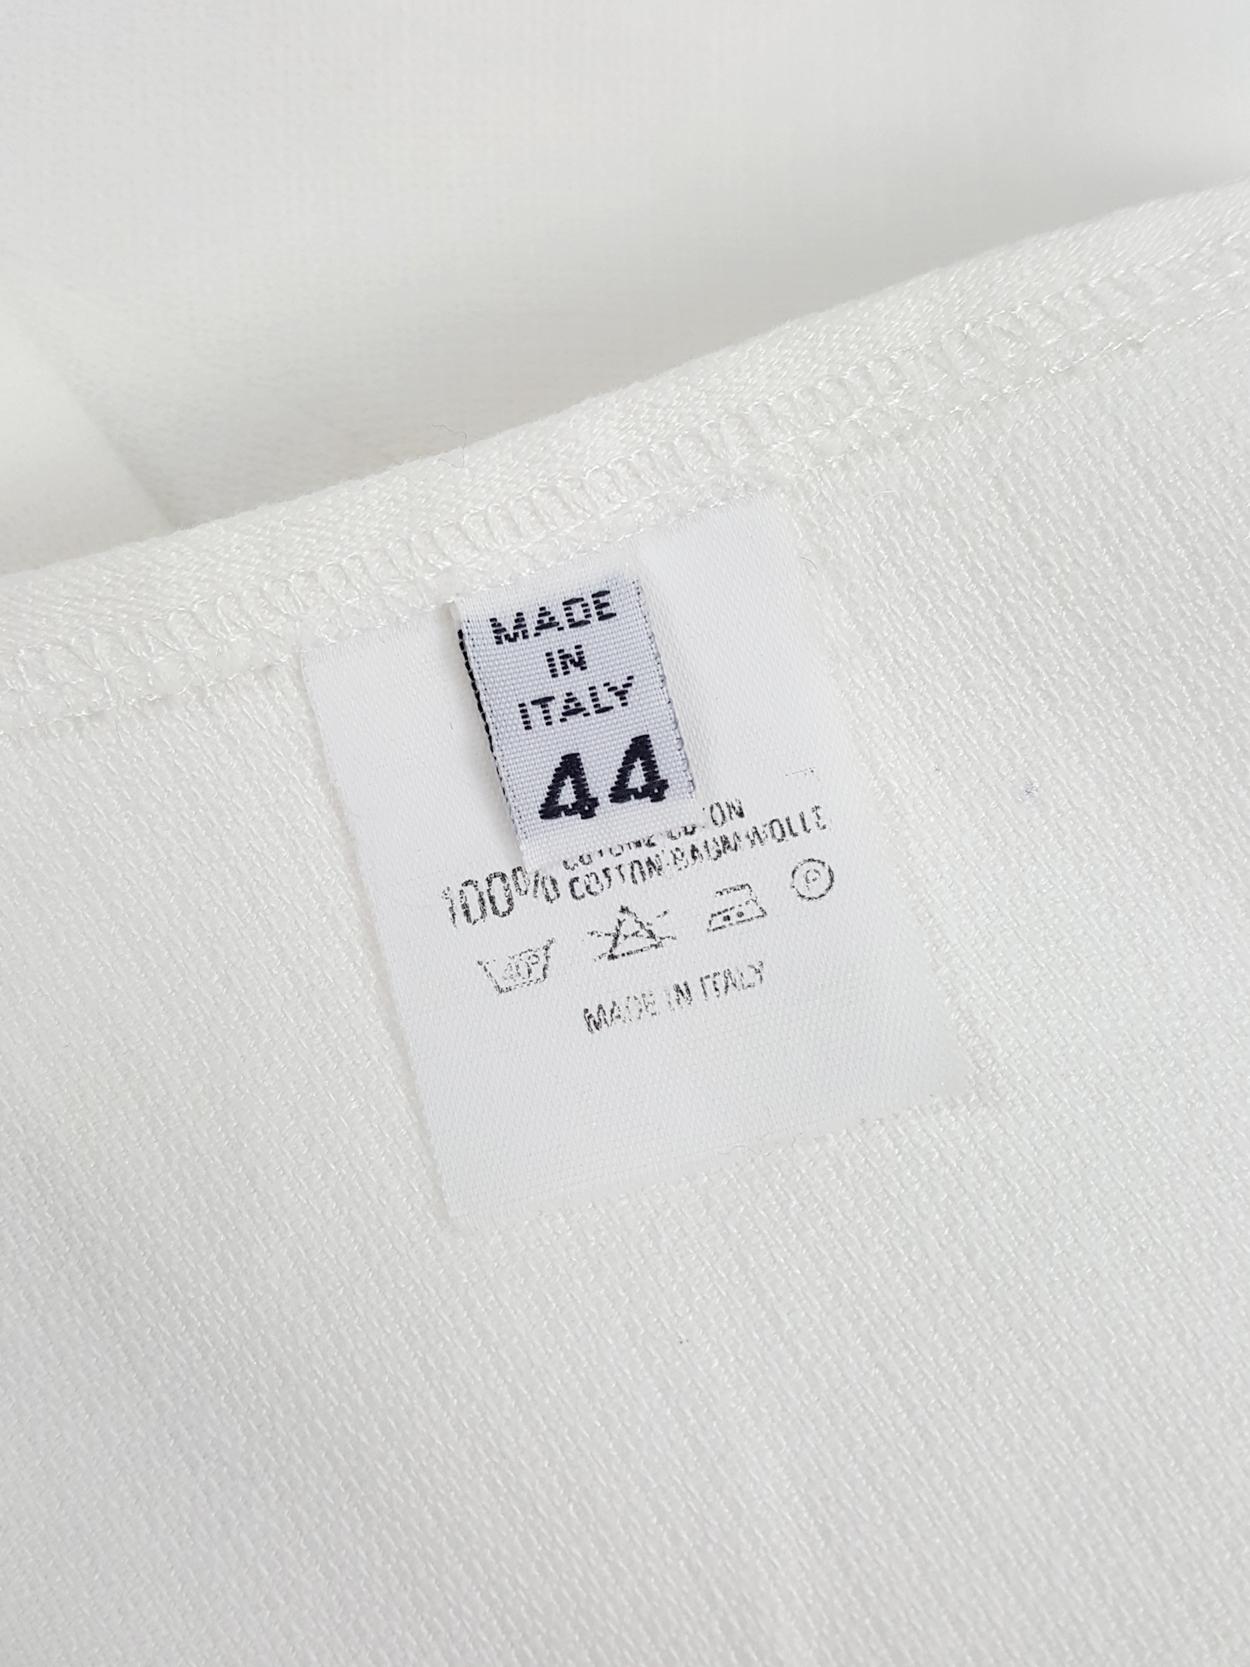 hot sale online 2eb64 56053 Maison Martin Margiela 6 white backless crop top — 1997/1998 ...